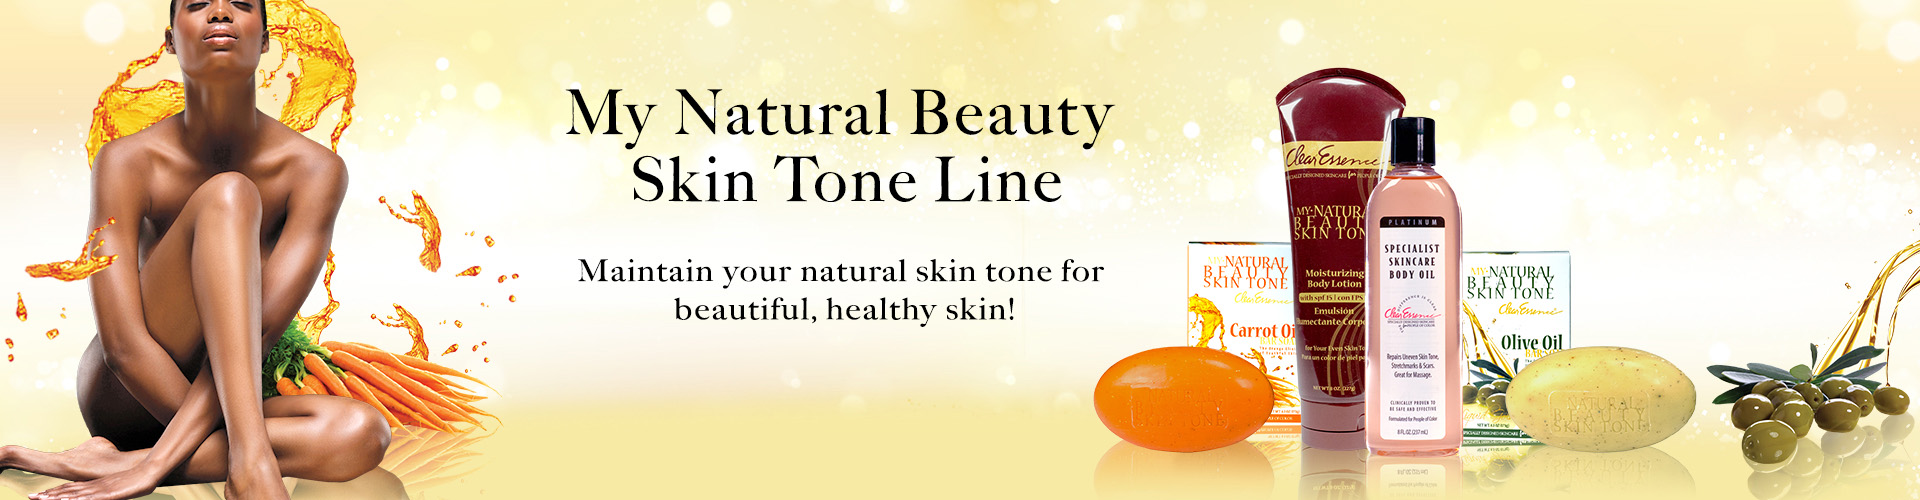 Clear Essence My Natural Beauty Skin Tone Skin Care Line